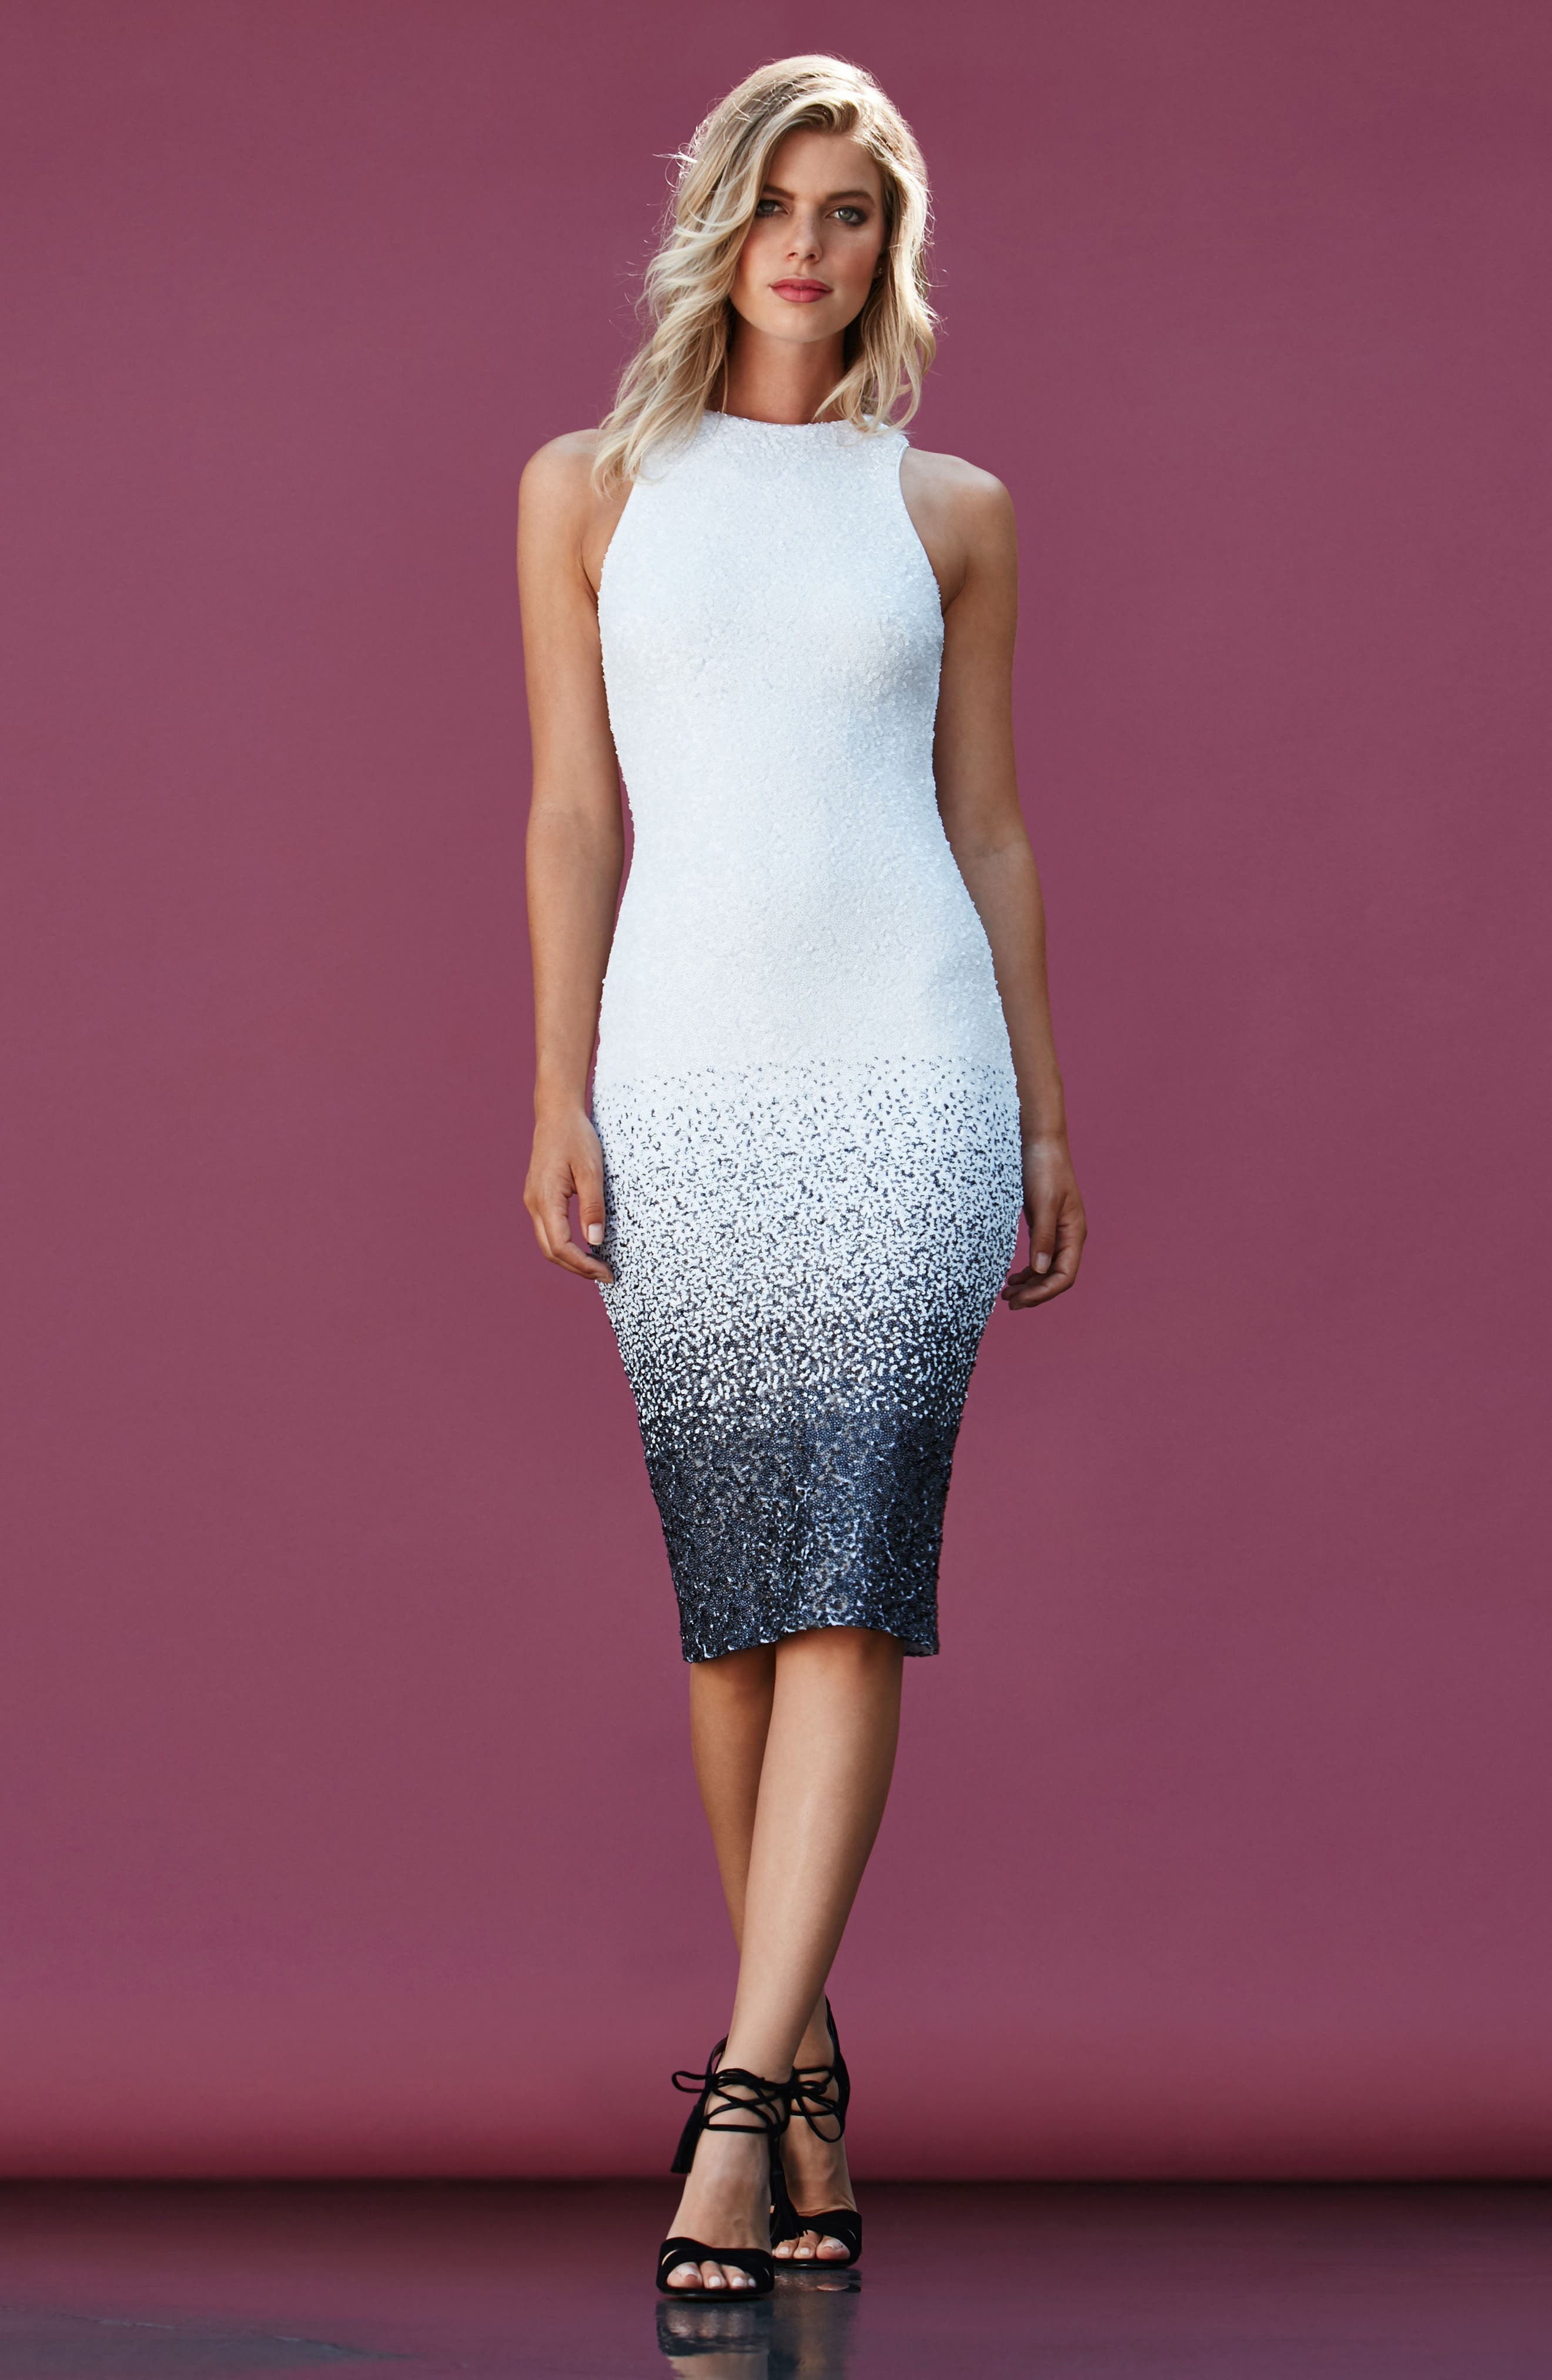 Shawn Sequin Midi Dress,                             Alternate thumbnail 6, color,                             121